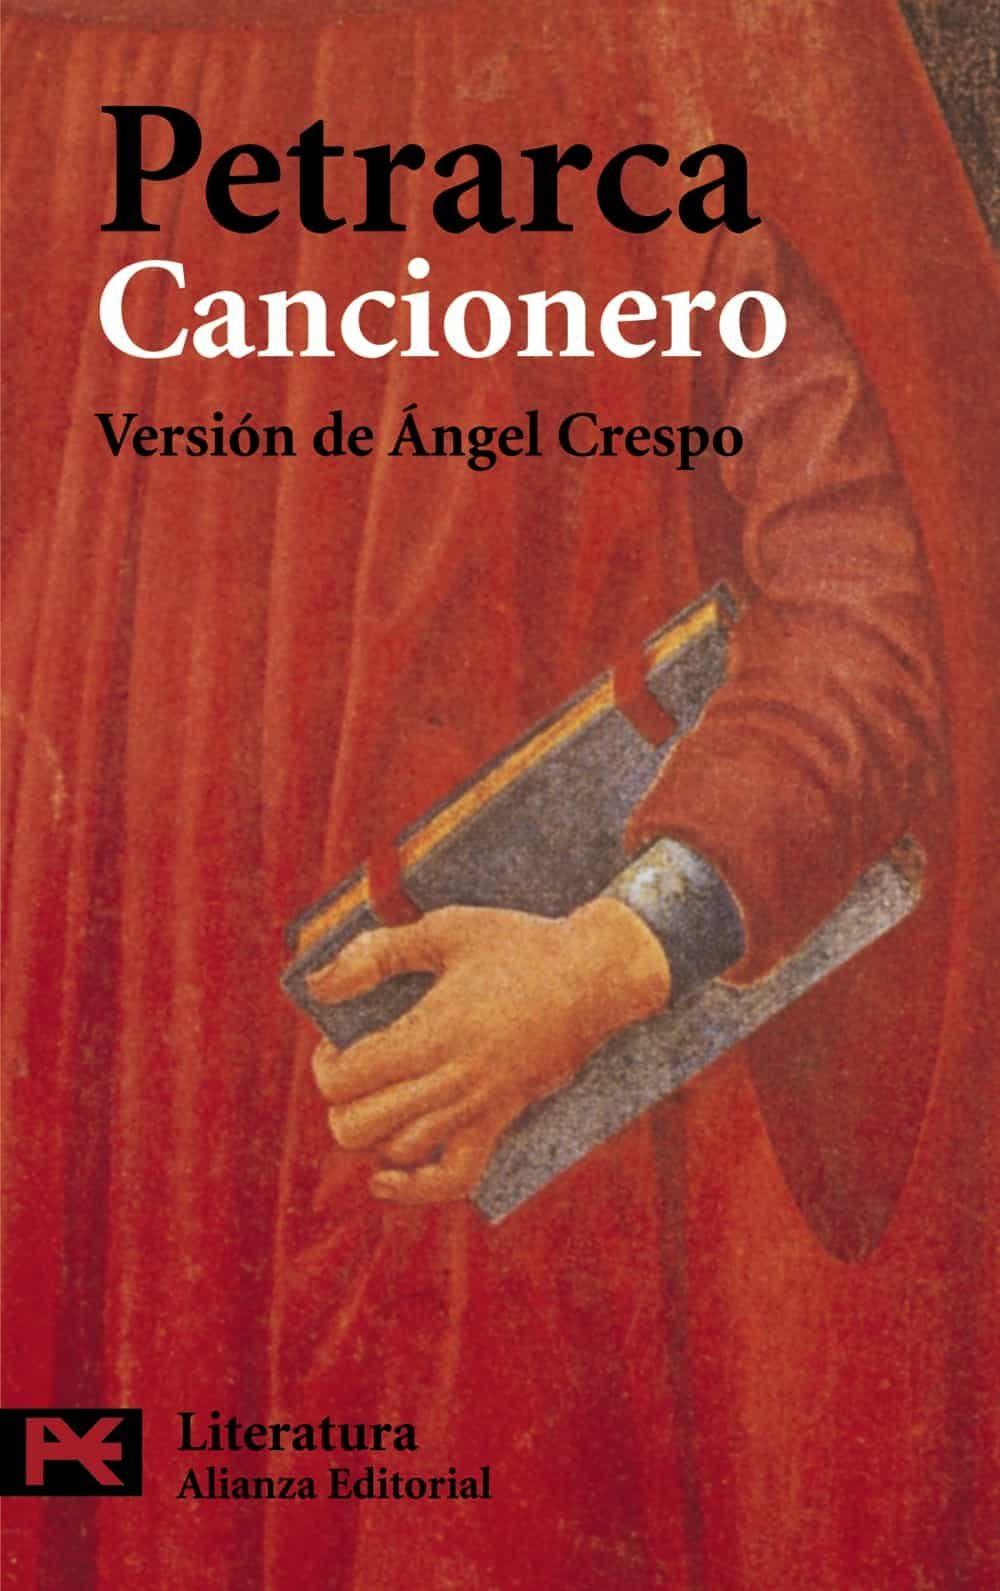 Cancionero - Petrarca Francesco